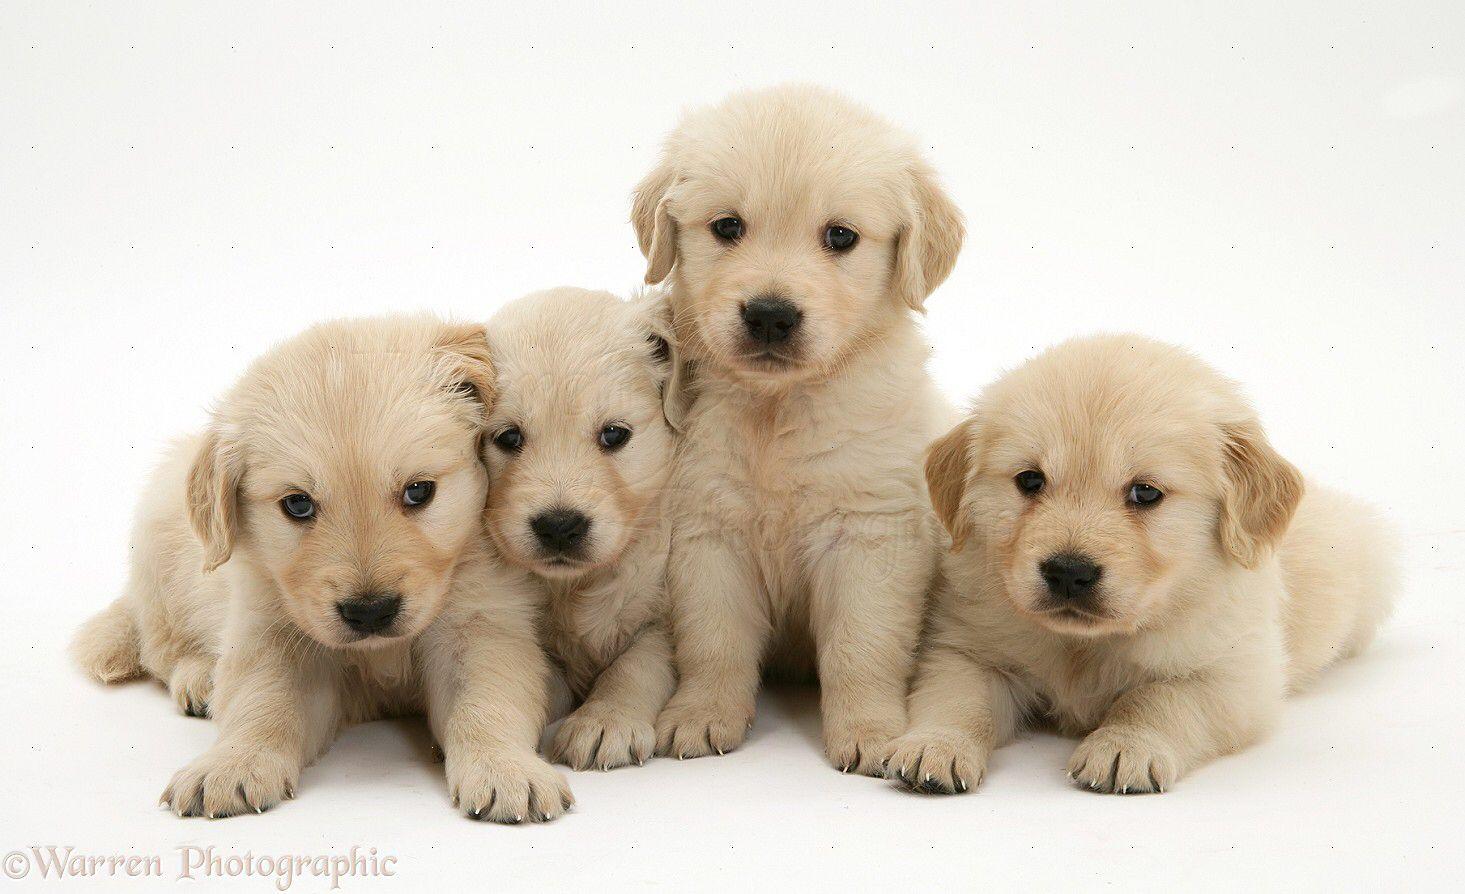 Puppies 3 Four Golden Retriever Puppies In Row White Background